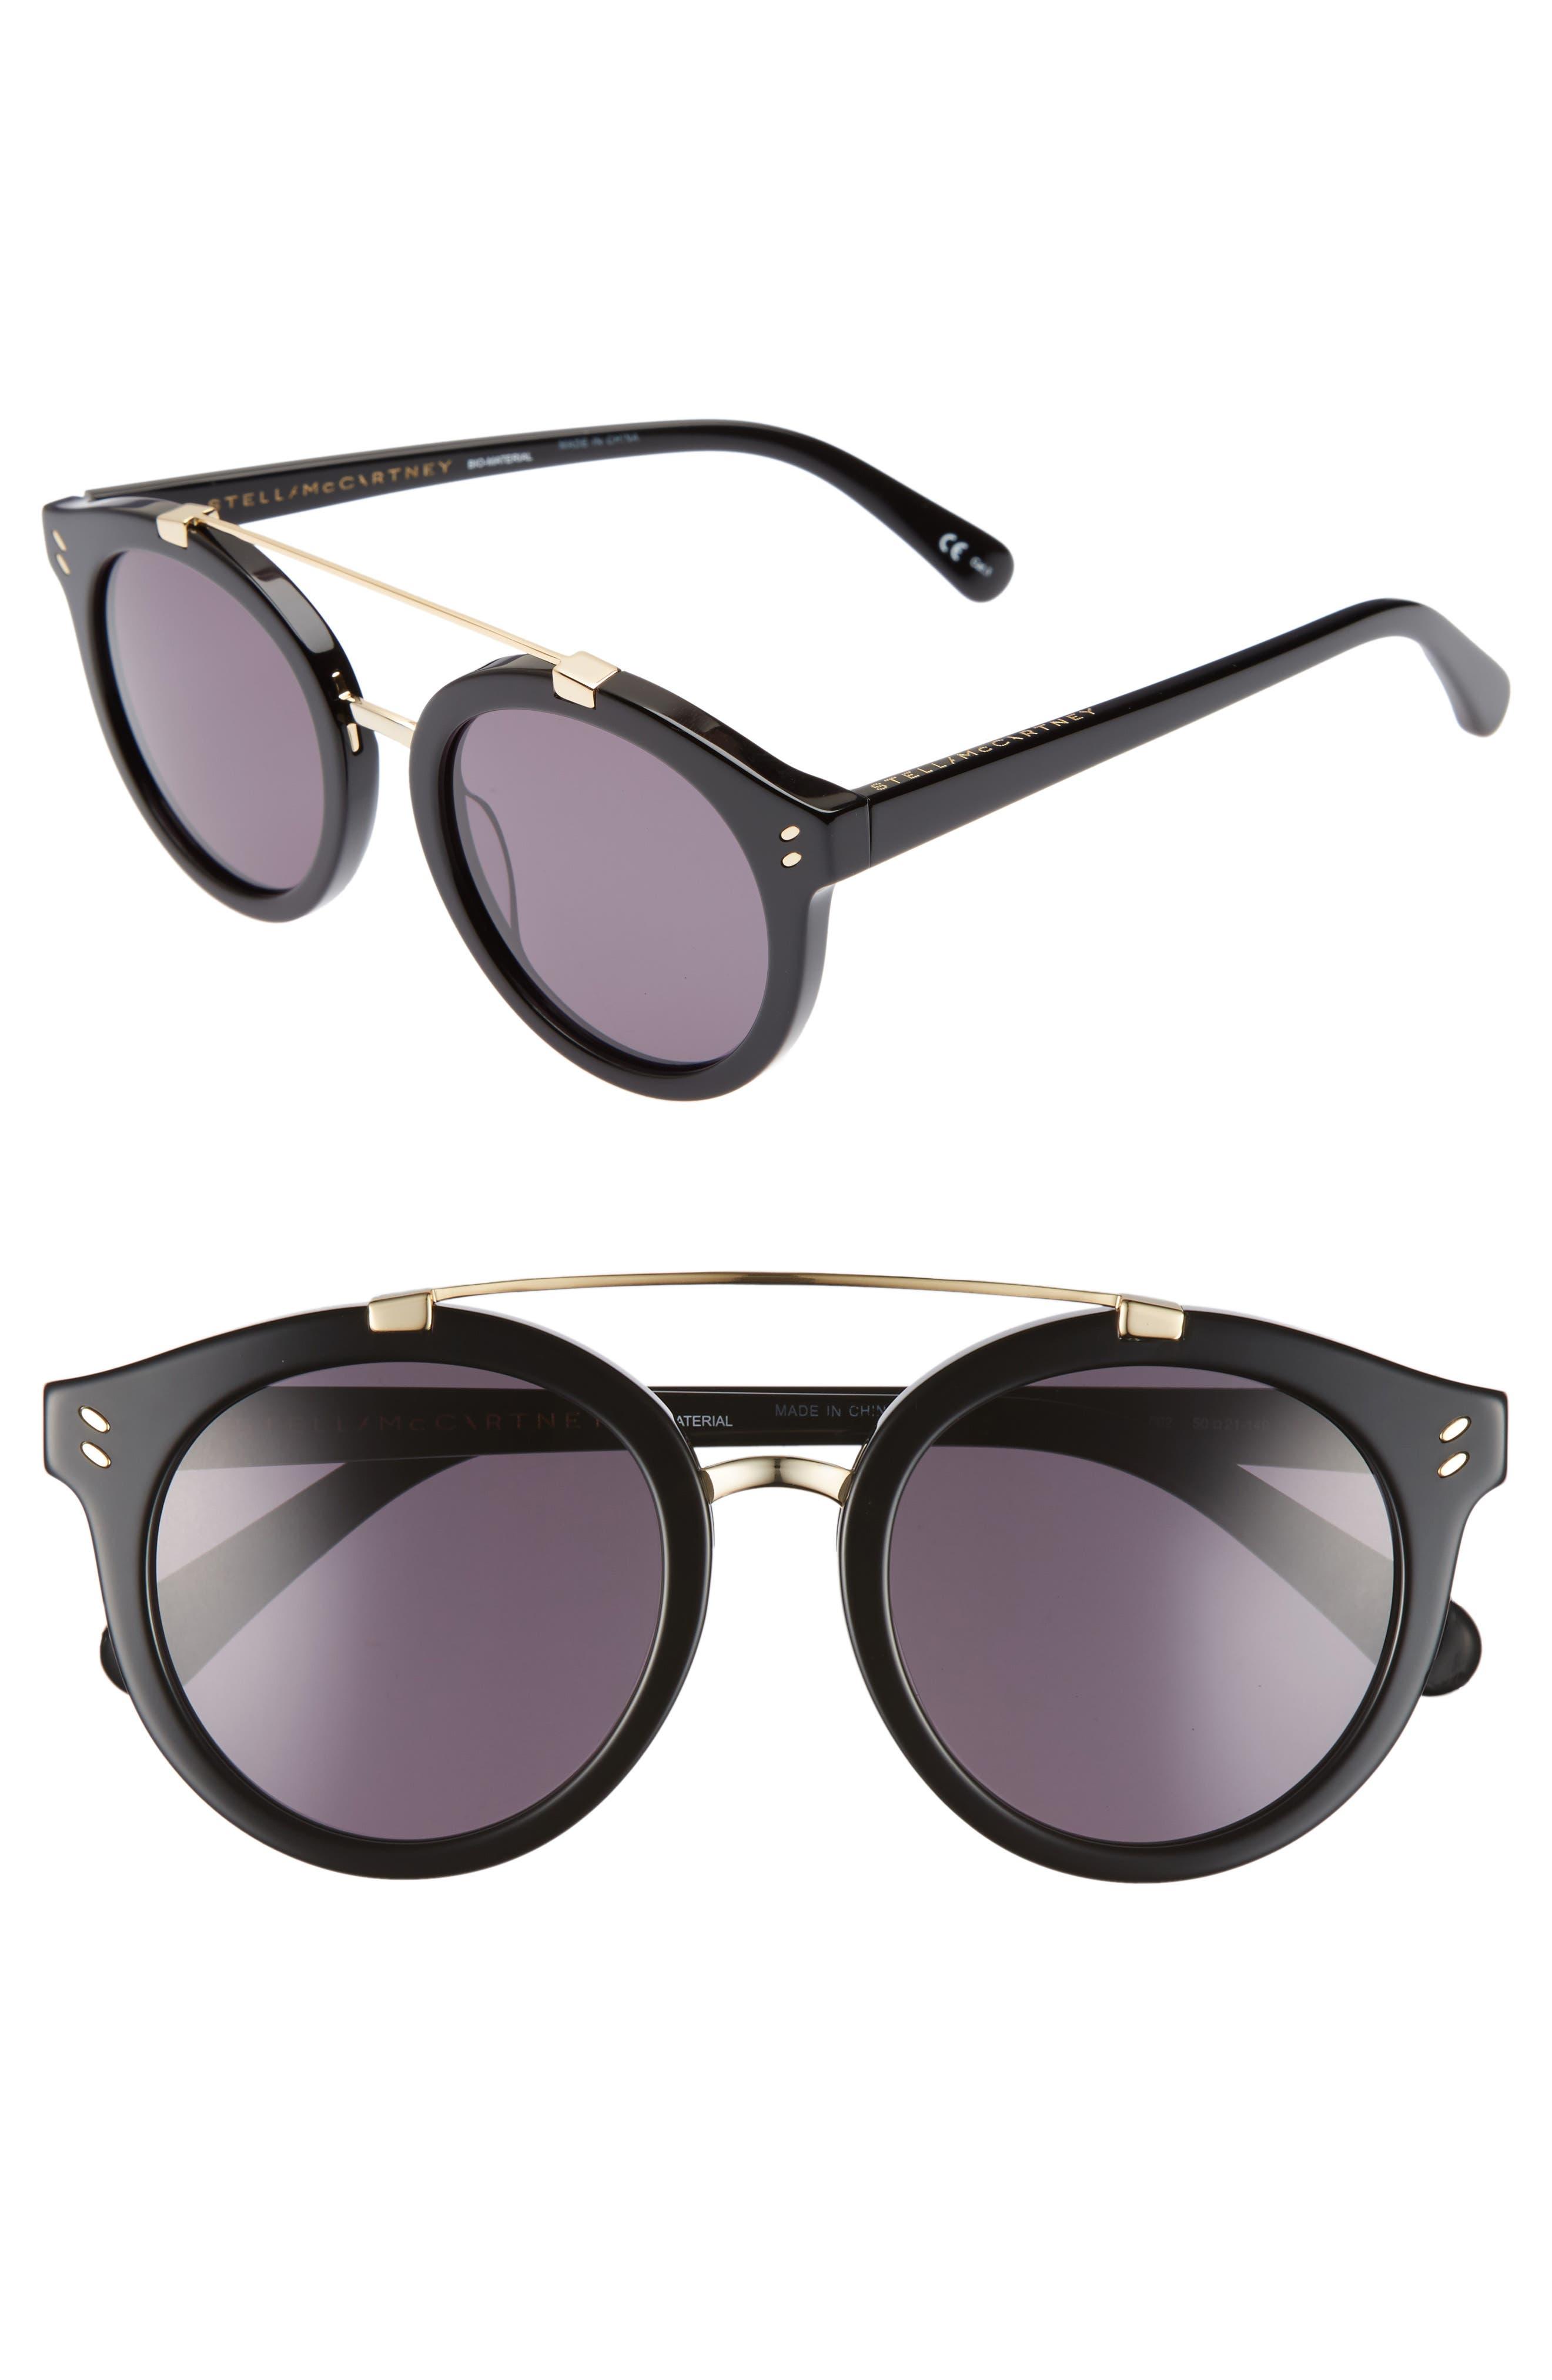 50mm Round Sunglasses,                             Main thumbnail 1, color,                             Black